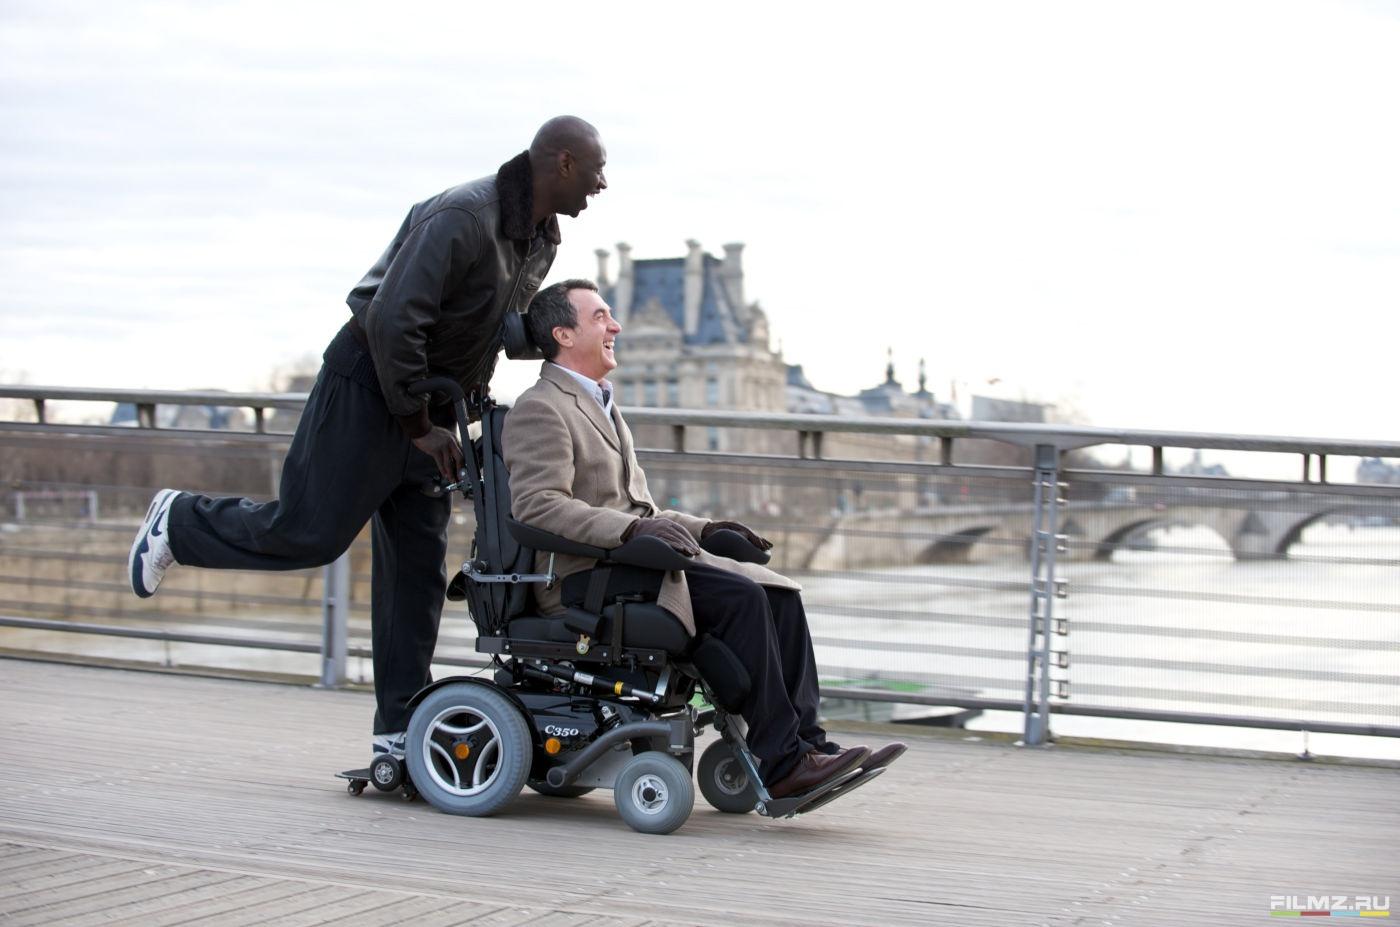 кадры из фильма 1+1 Омар Си, Франсуа Клюзе,